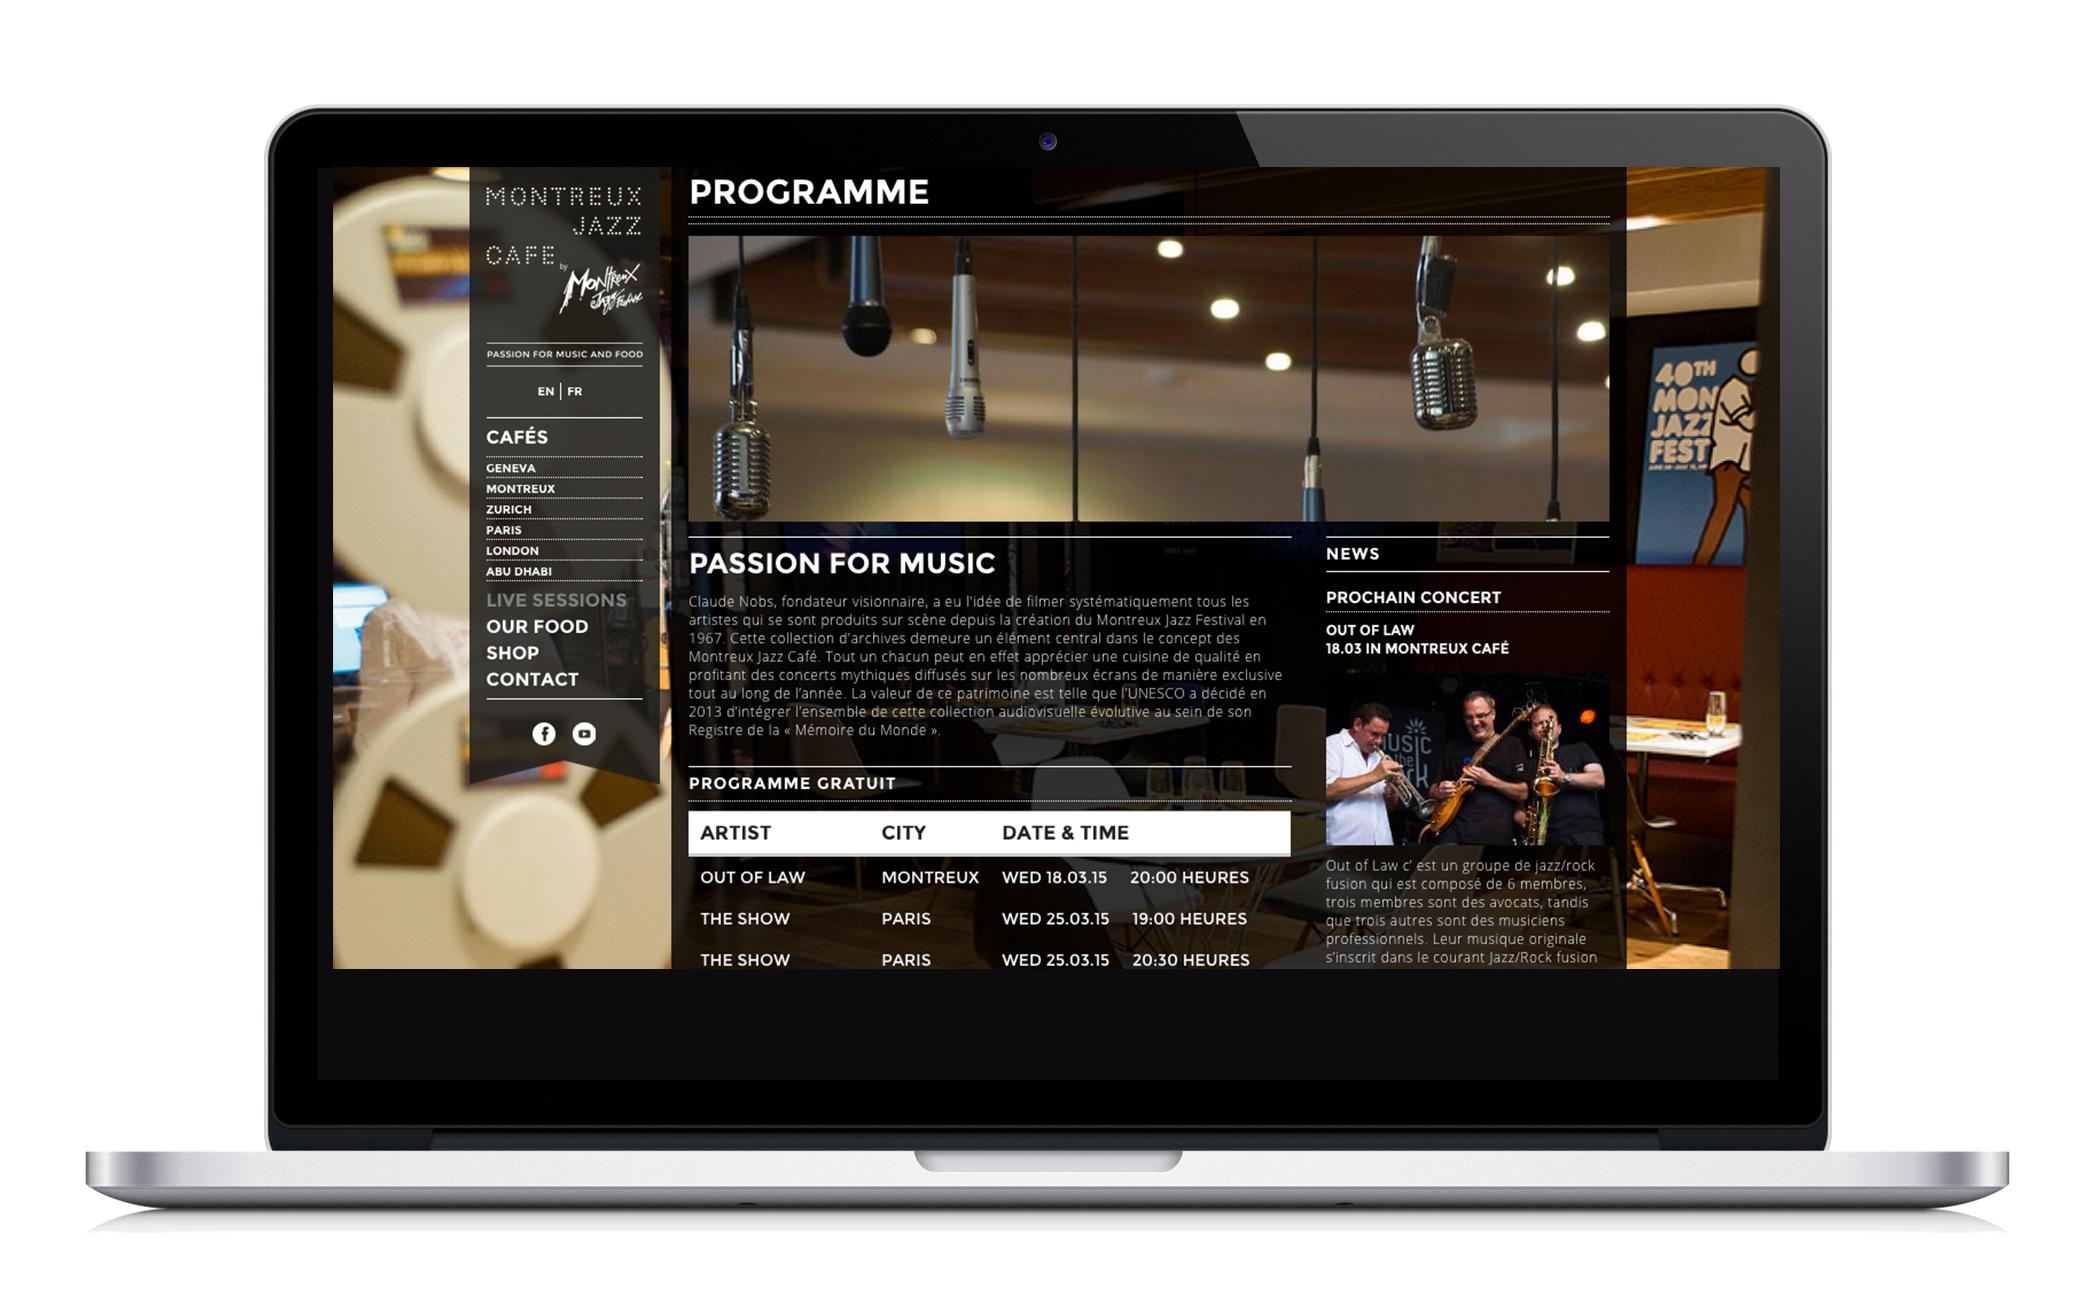 MJC-website-2015-02